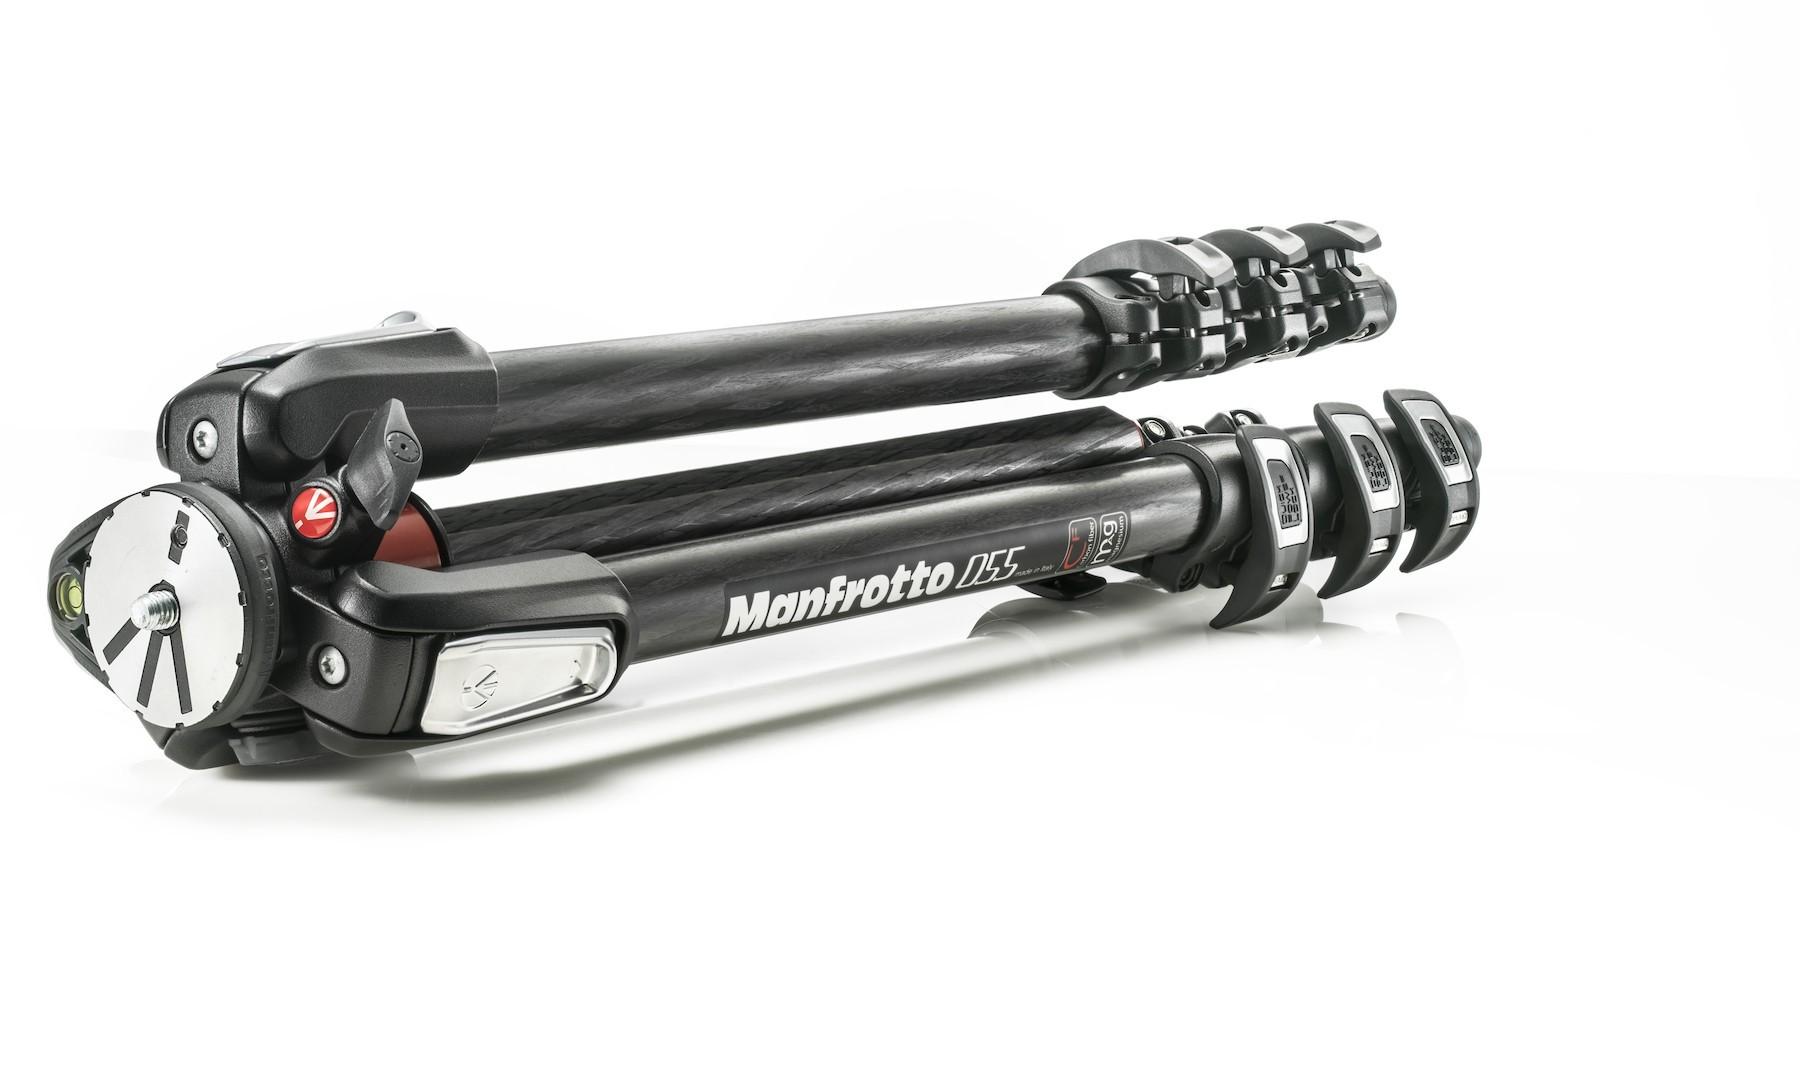 Manfrotto MT055CXPRO4